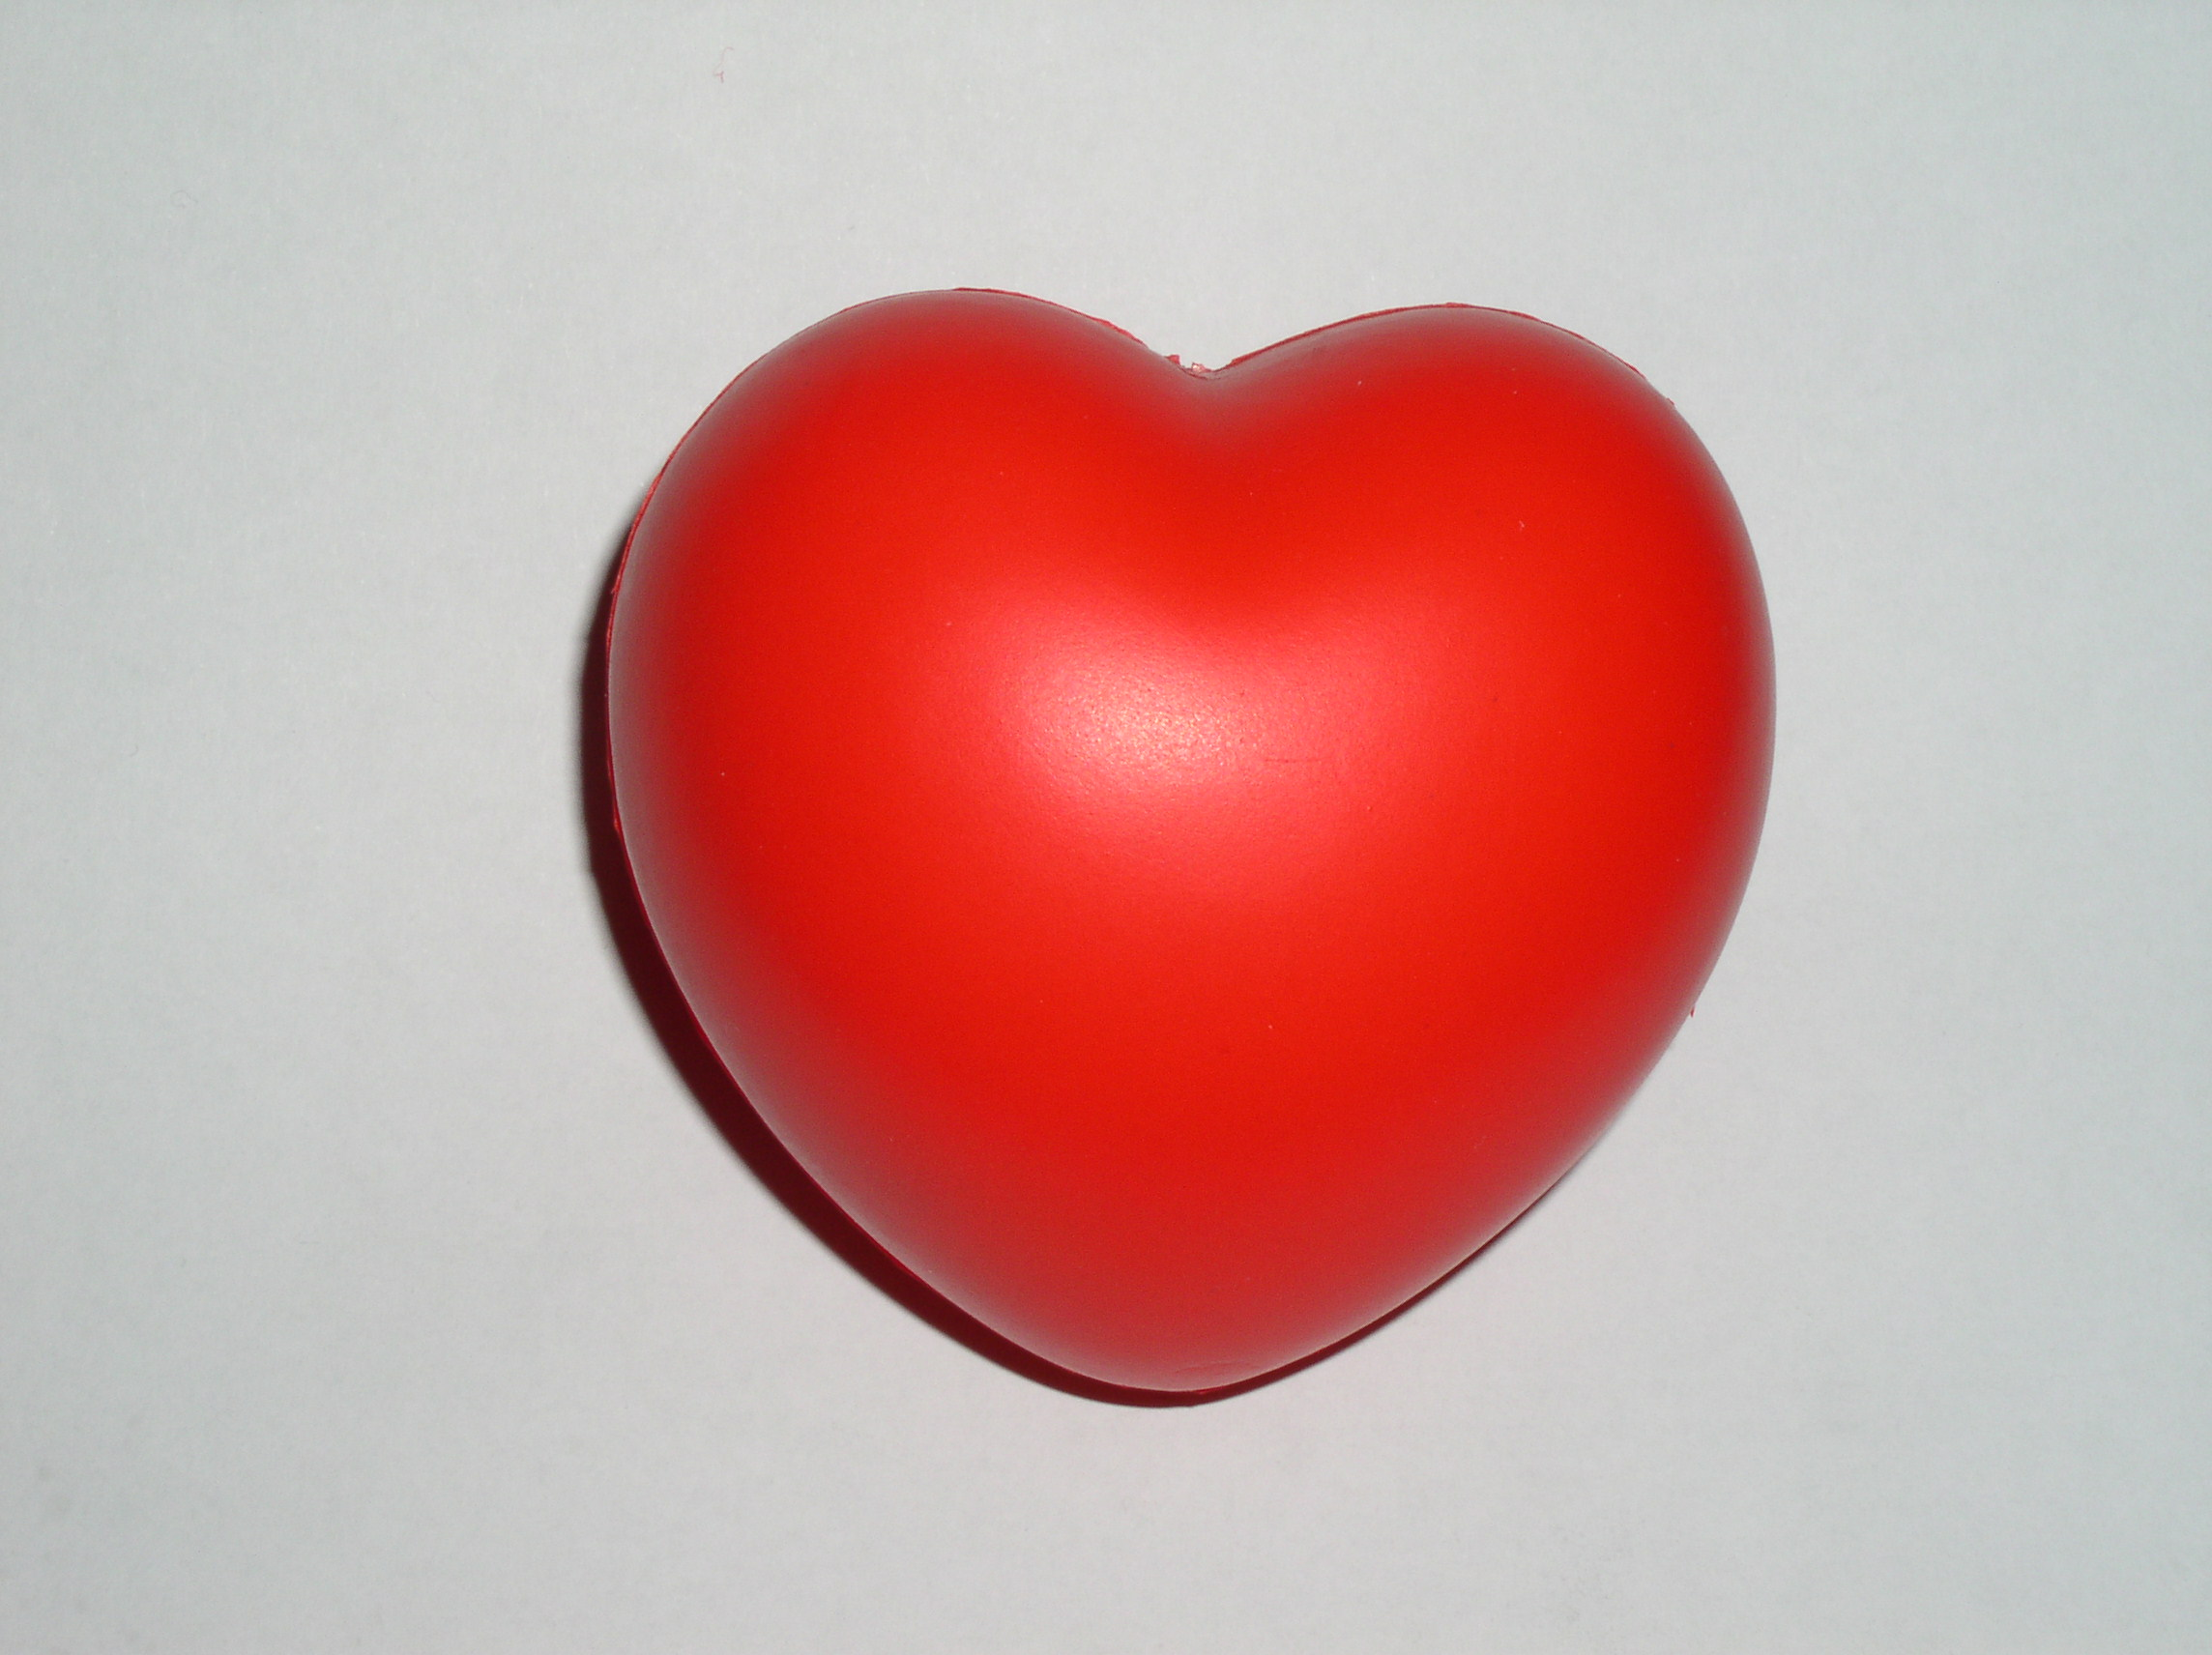 http://www.dm.unibo.it/~morigi/homepage_file/research_file/scan_db/images/cuore/cuore_foto.jpg